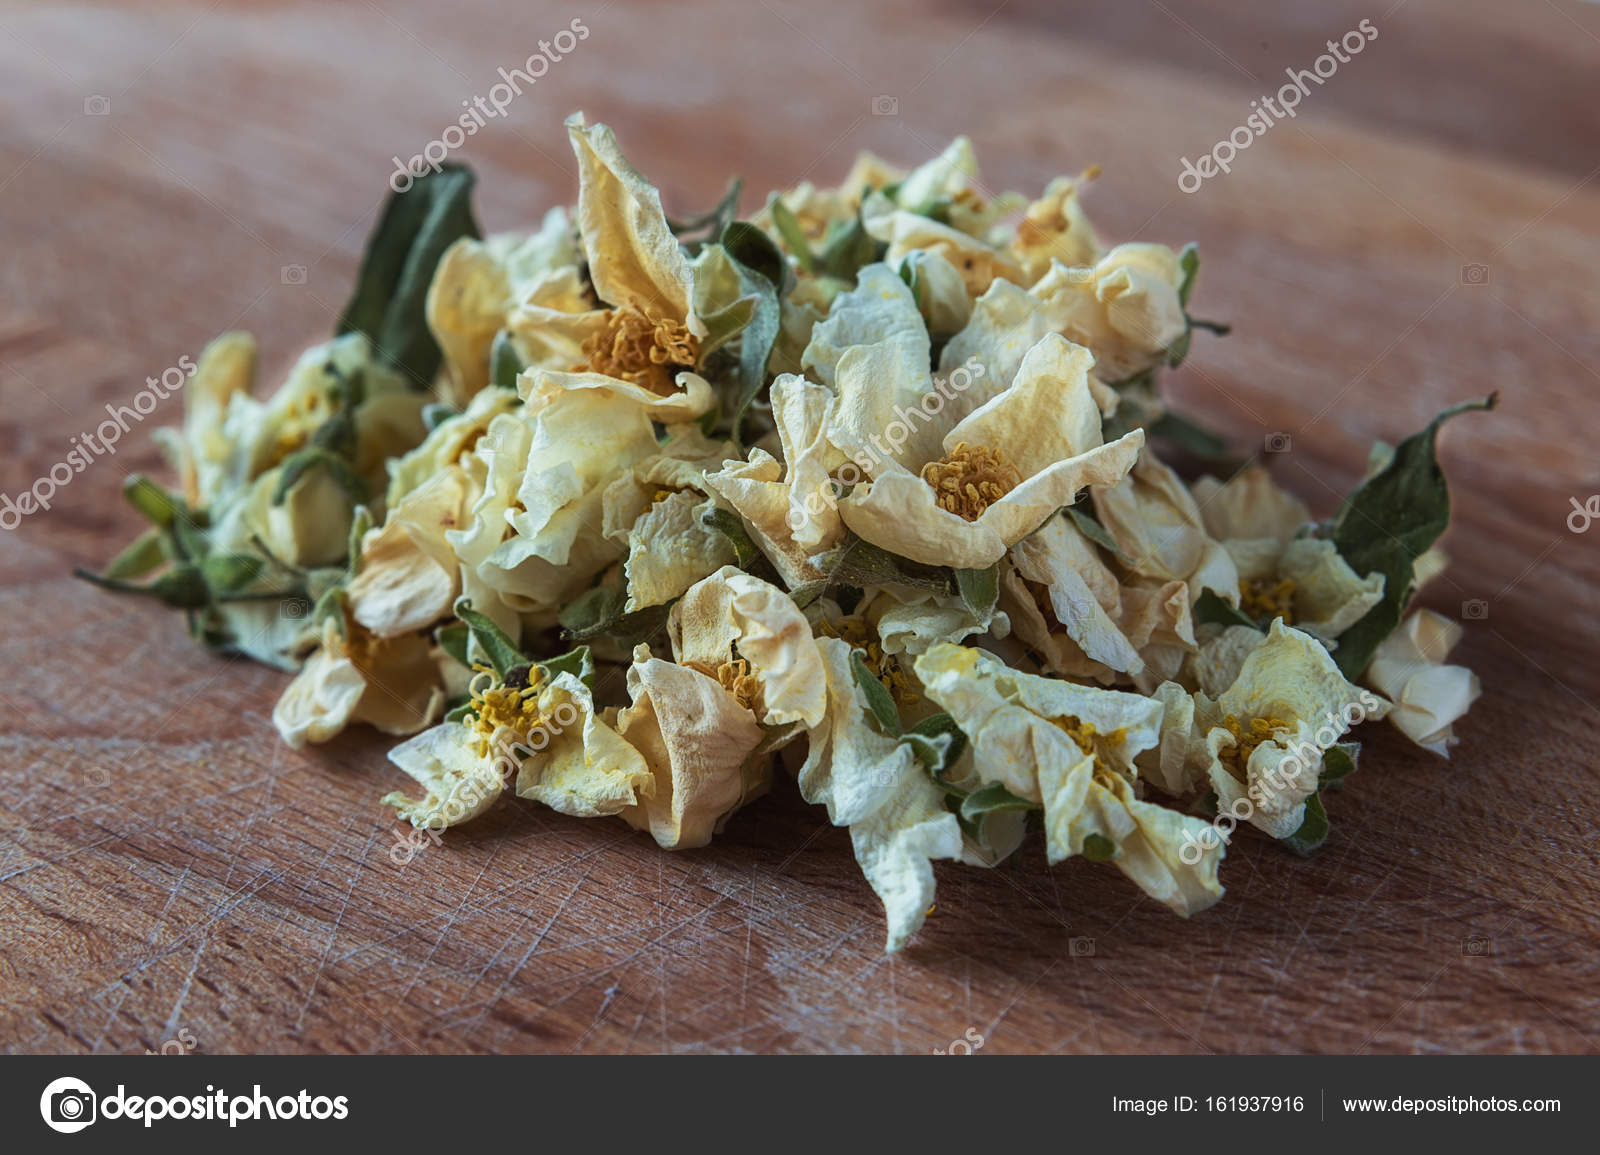 Dried Jasmine Flowers For Tea Stock Photo Almandreev 161937916